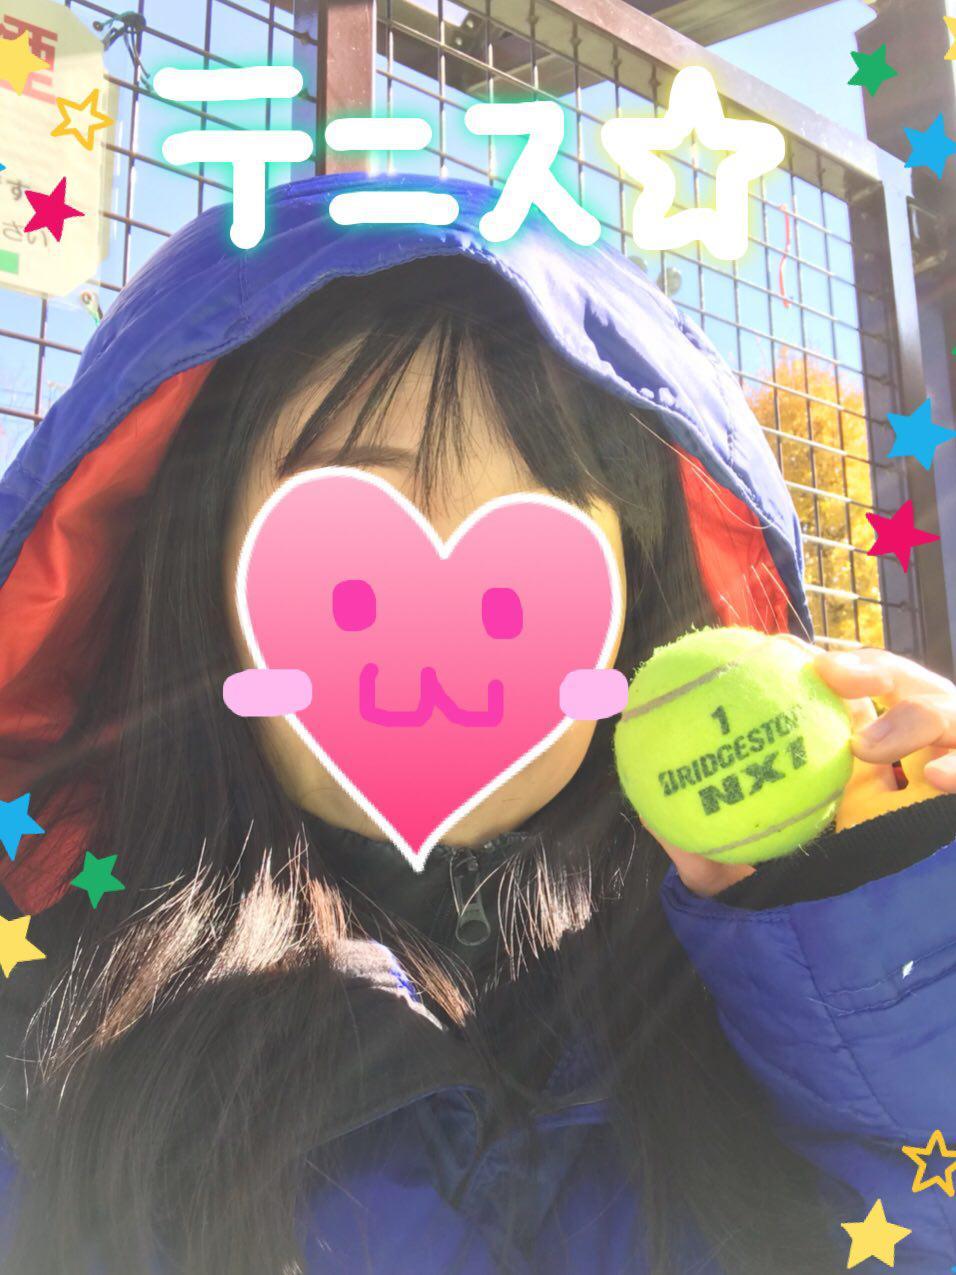 photo_2017-11-19_20-52-54.jpg